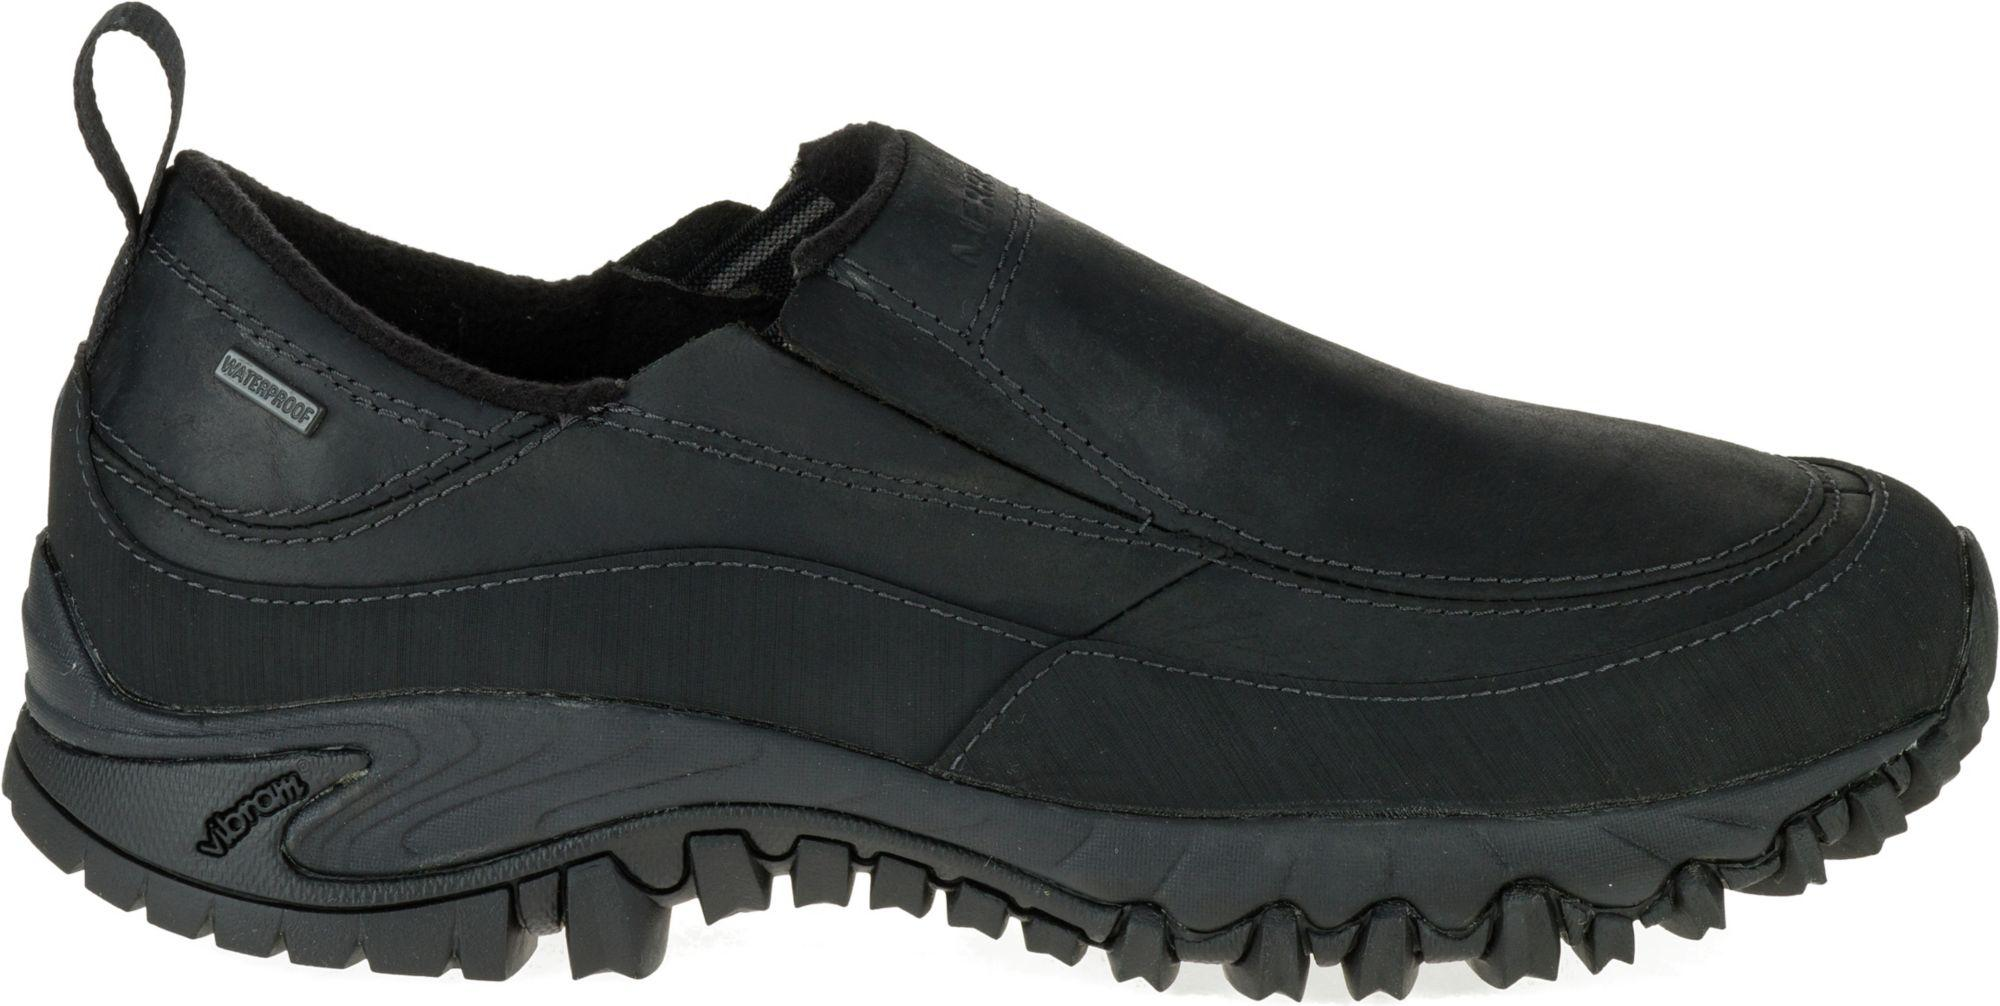 Merrell. Men's Black Shiver Moc 2 Waterproof Casual Shoes